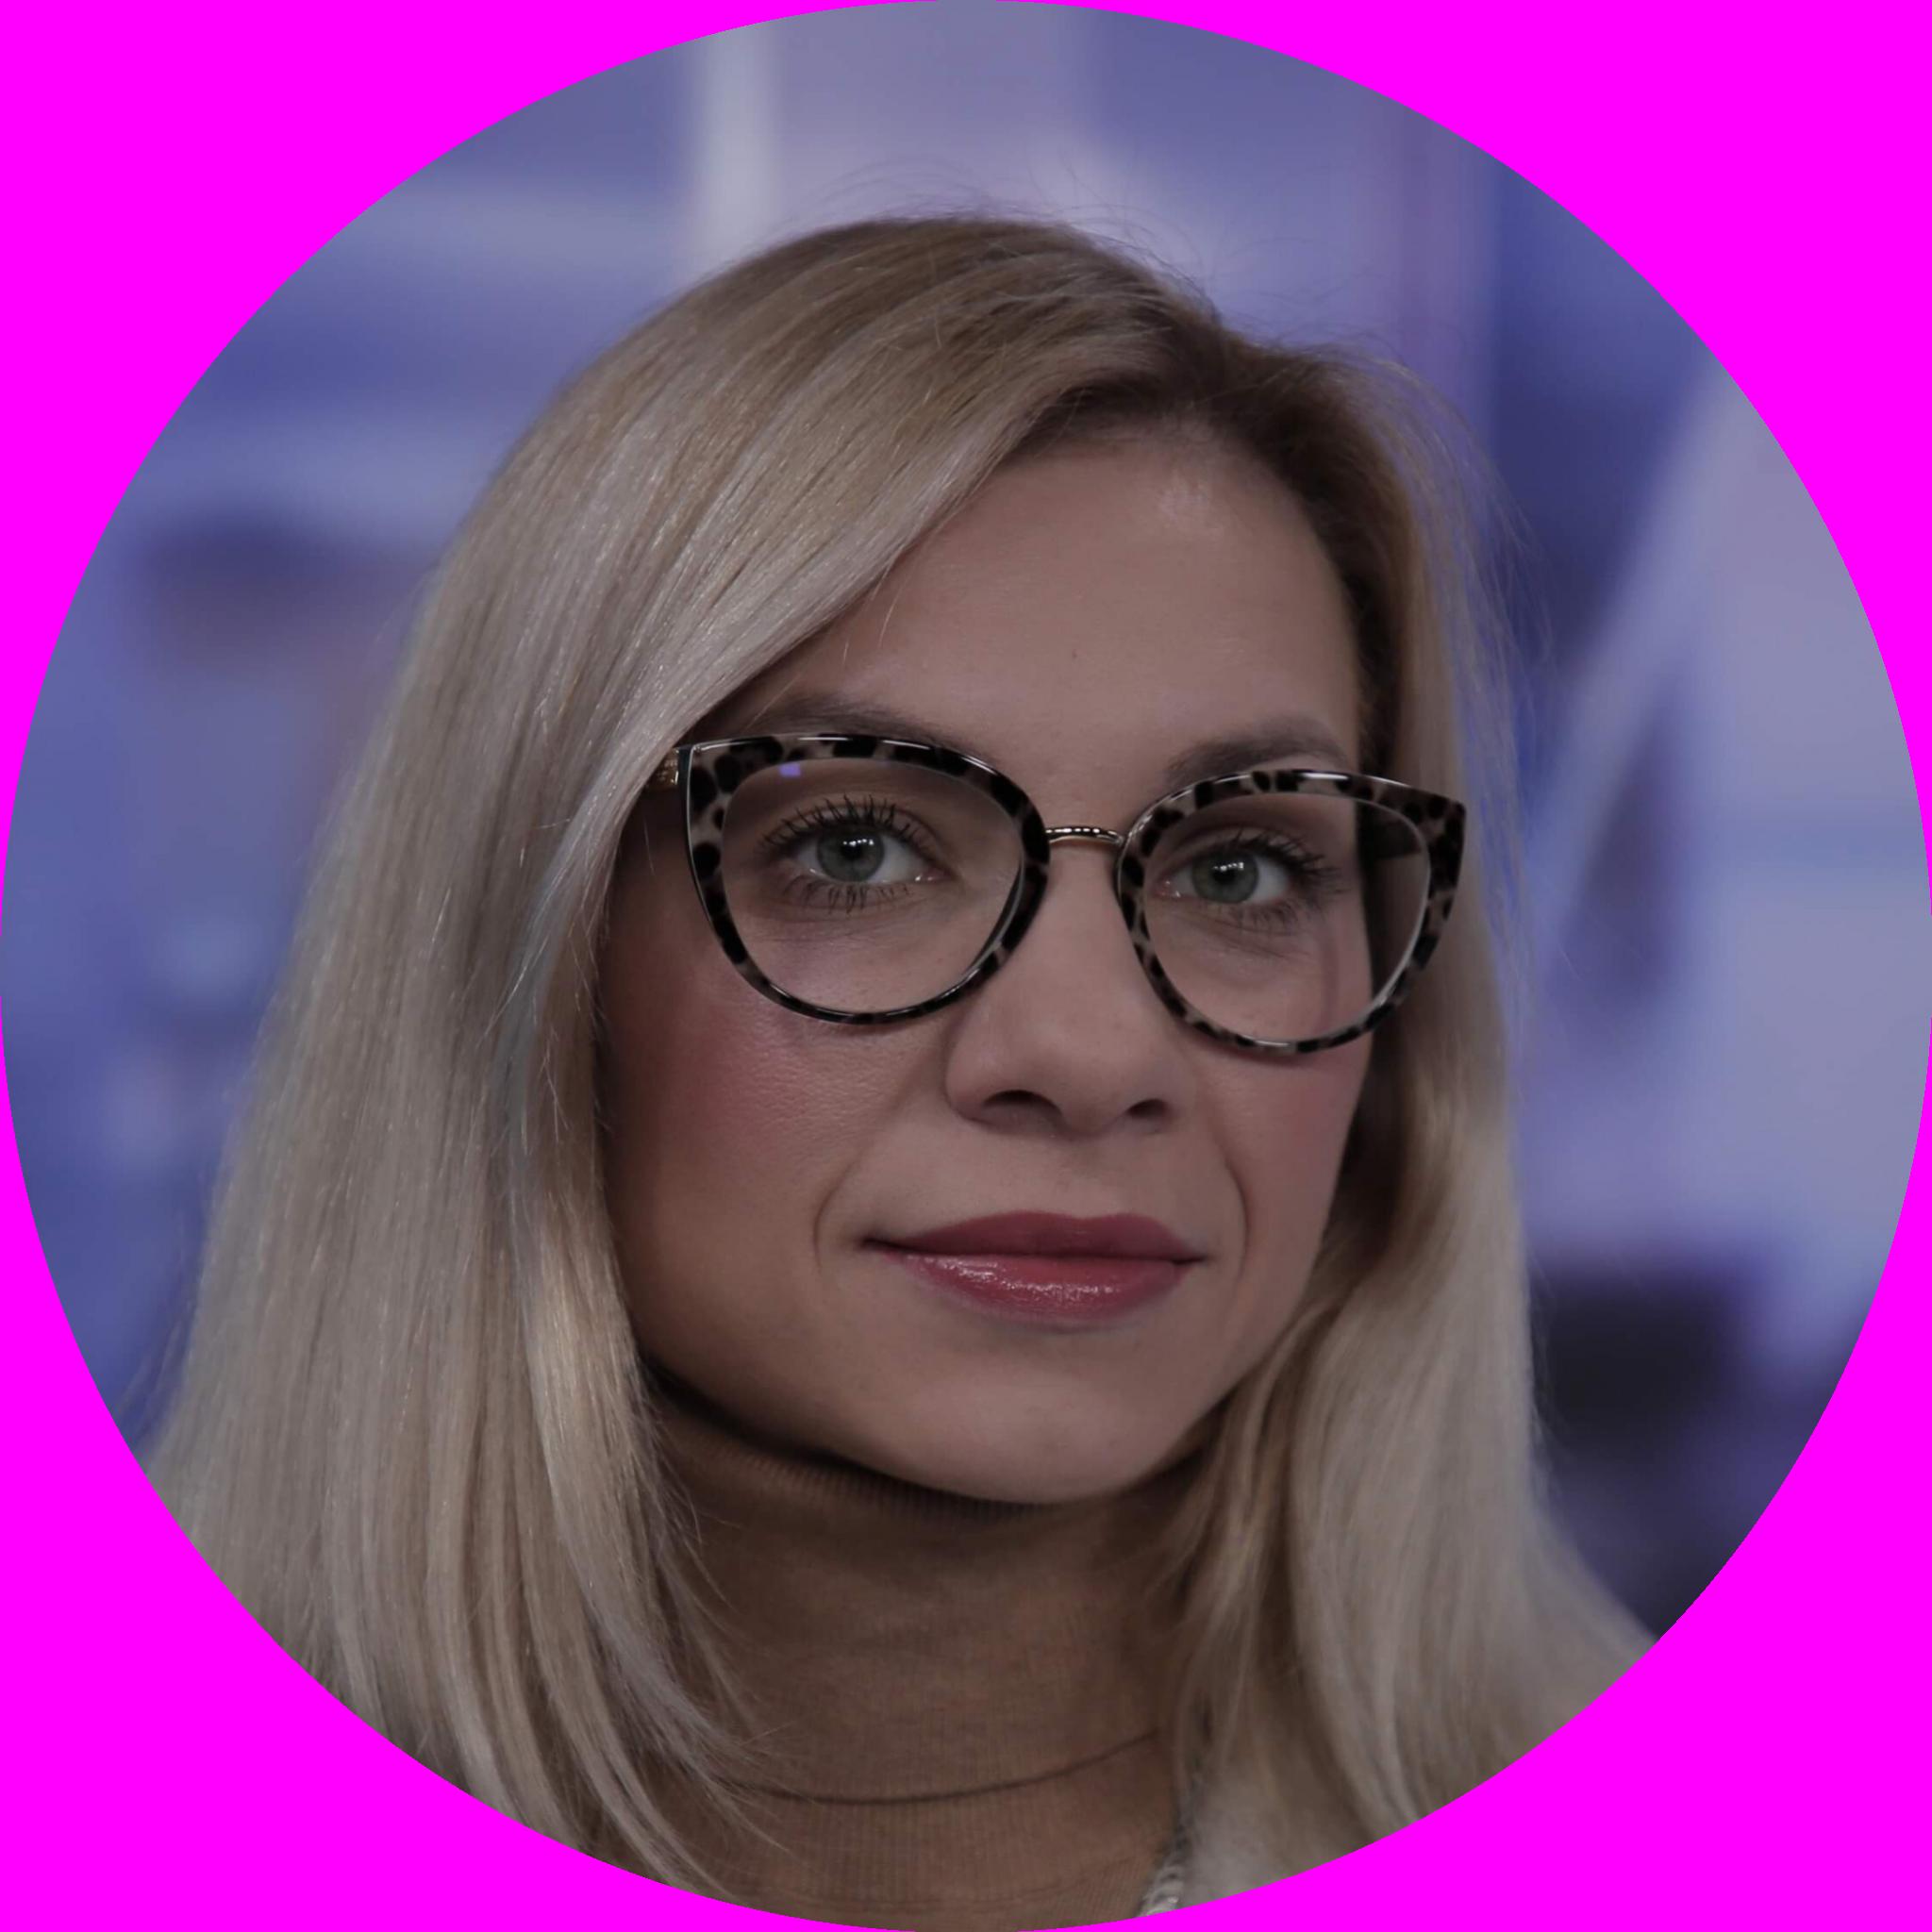 Portrait von Mariia Solkina